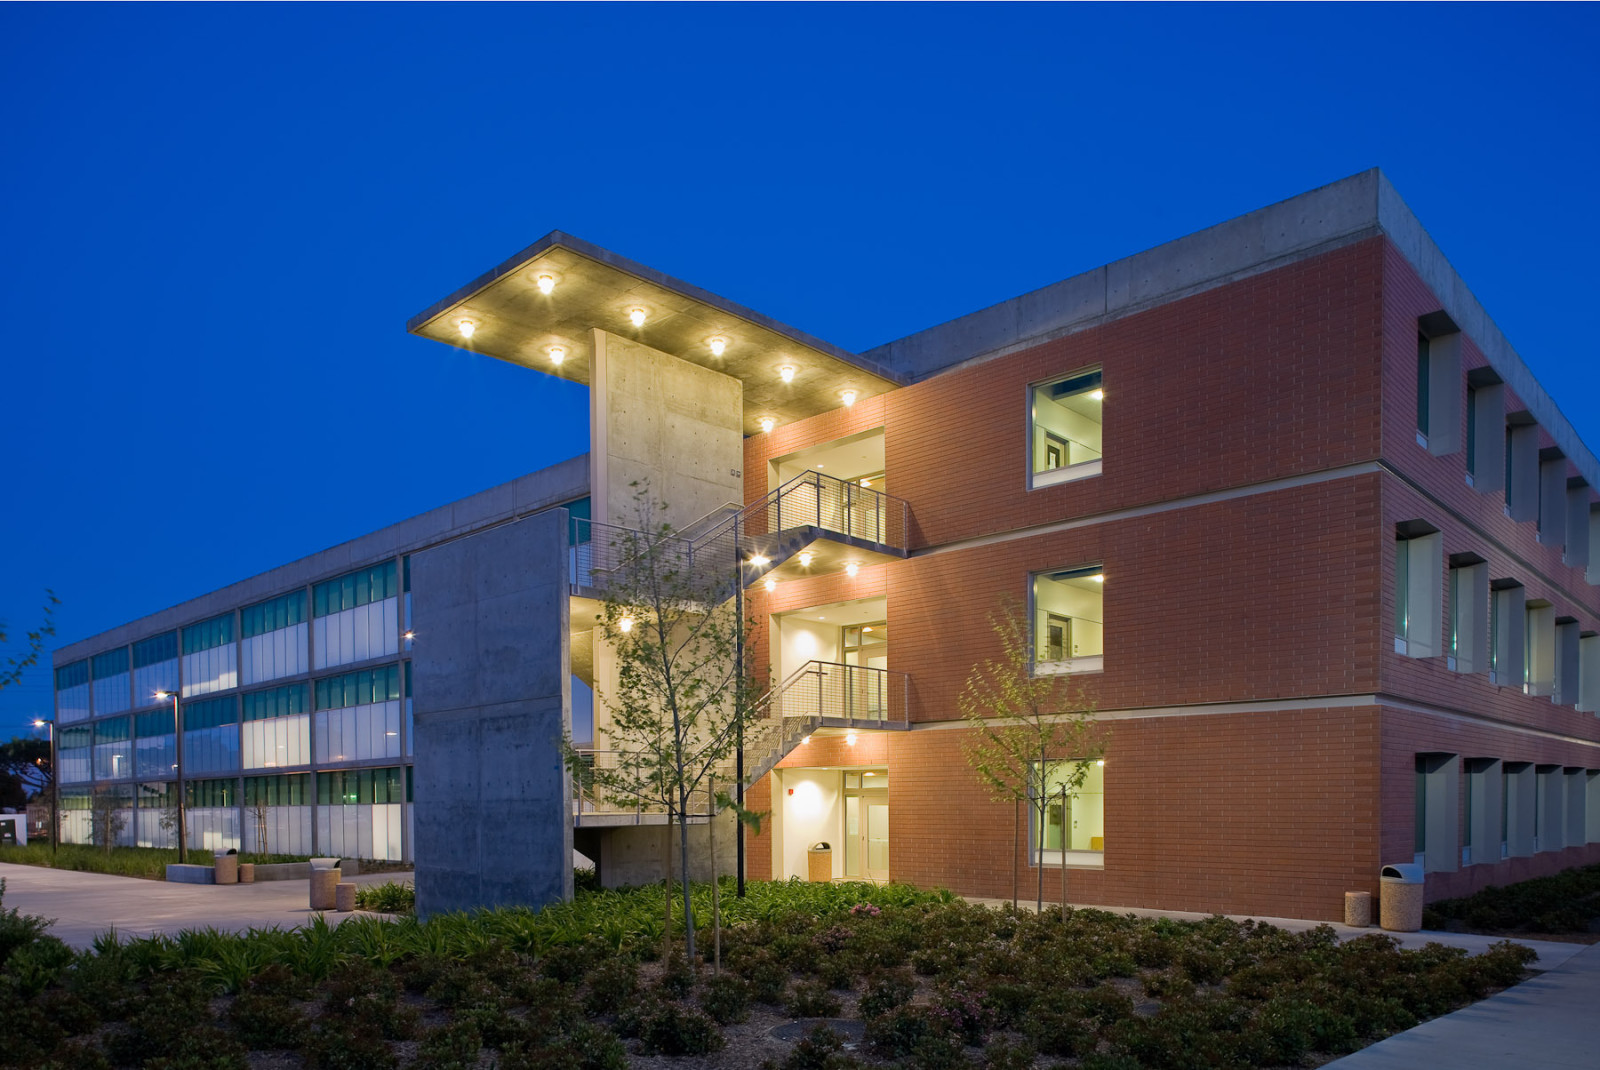 El Camino College >> Summer Sessions Available At El Camino College Kenbrownecc